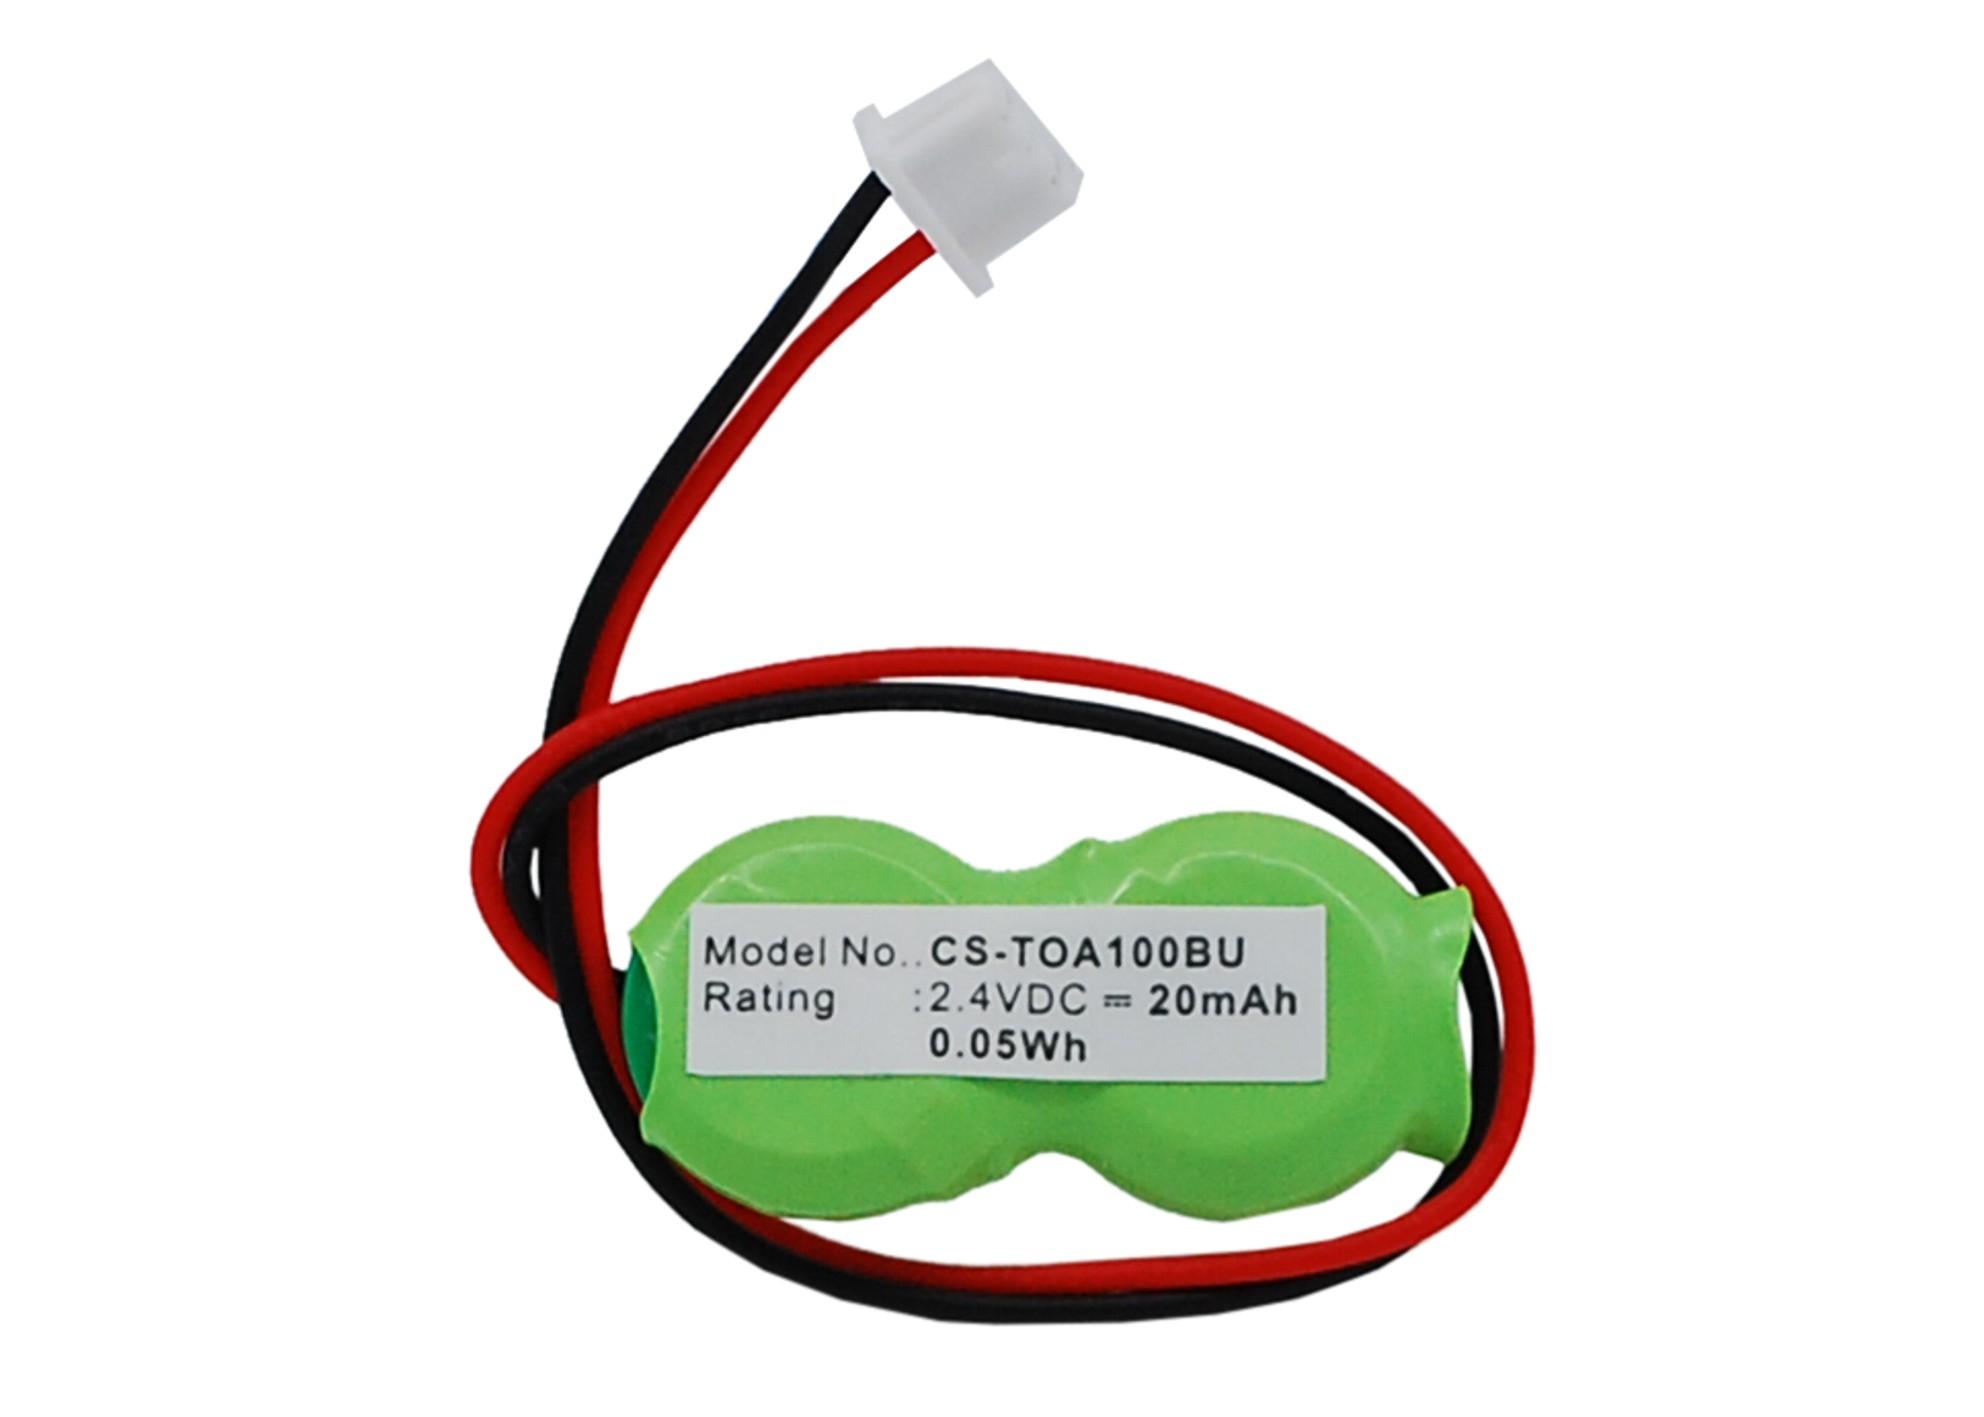 Cameron Sino baterie cmos pro TOSHIBA Portege R600-S4201 2.4V Ni-MH 20mAh zelená - neoriginální